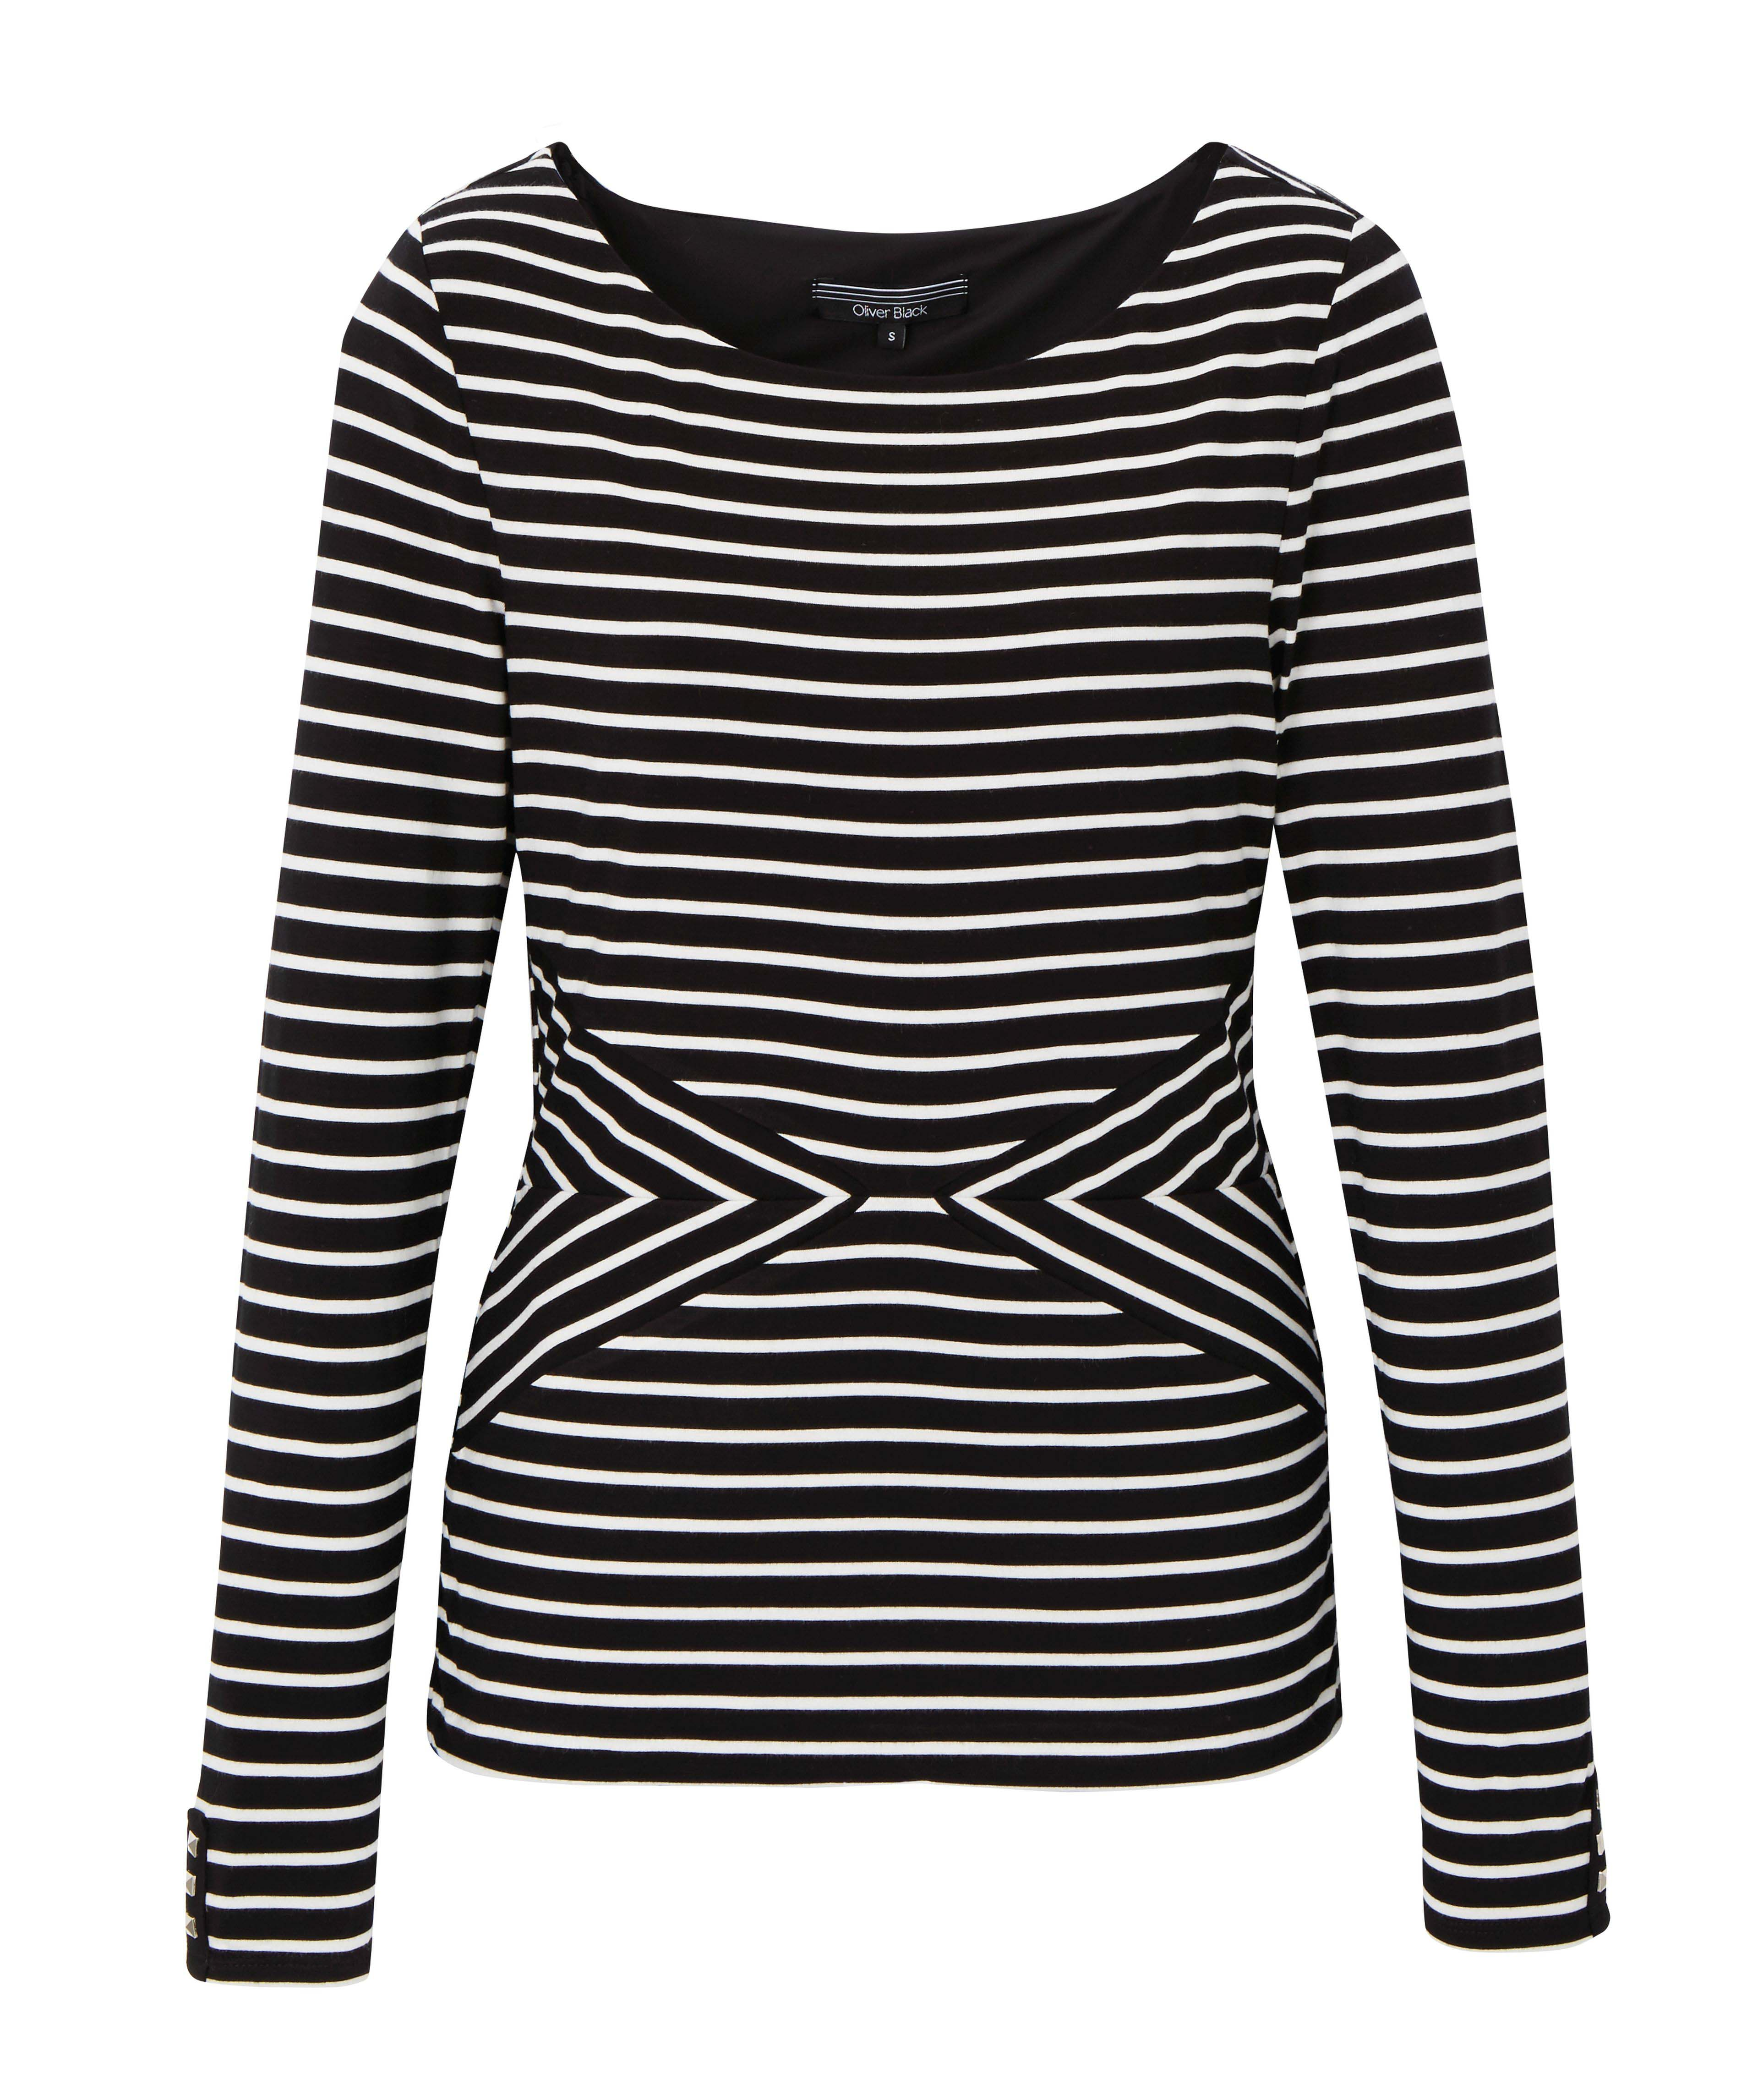 6089541 Oliver Black LS Stripe Knit Top Black and White $69.99 Instore 1 Apr 2016